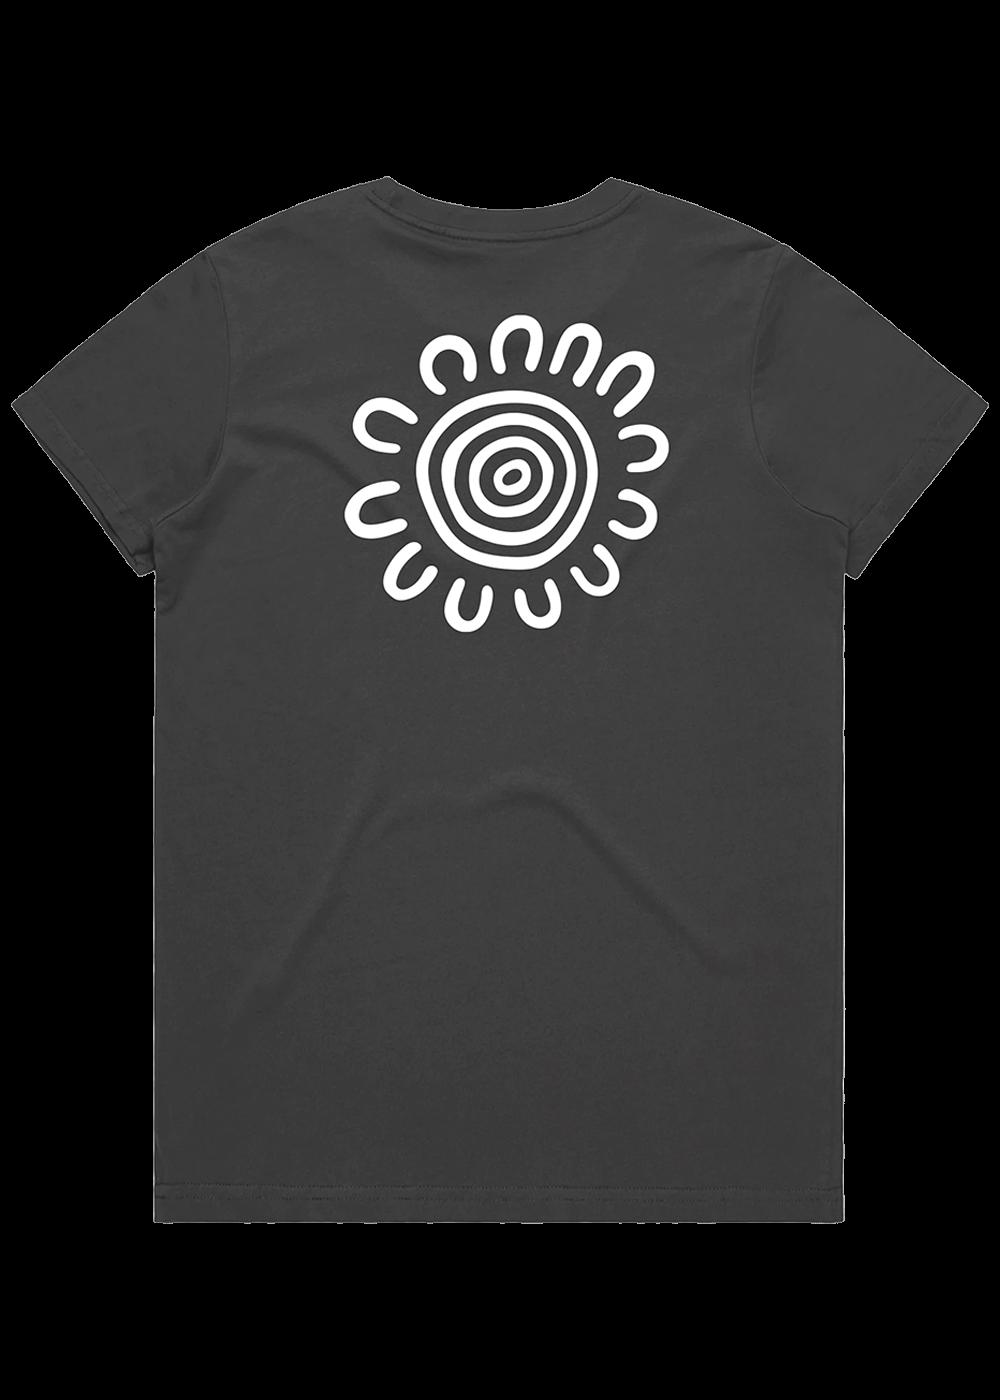 AMAA Yarning Circle Relaxed T-Shirt - Women's